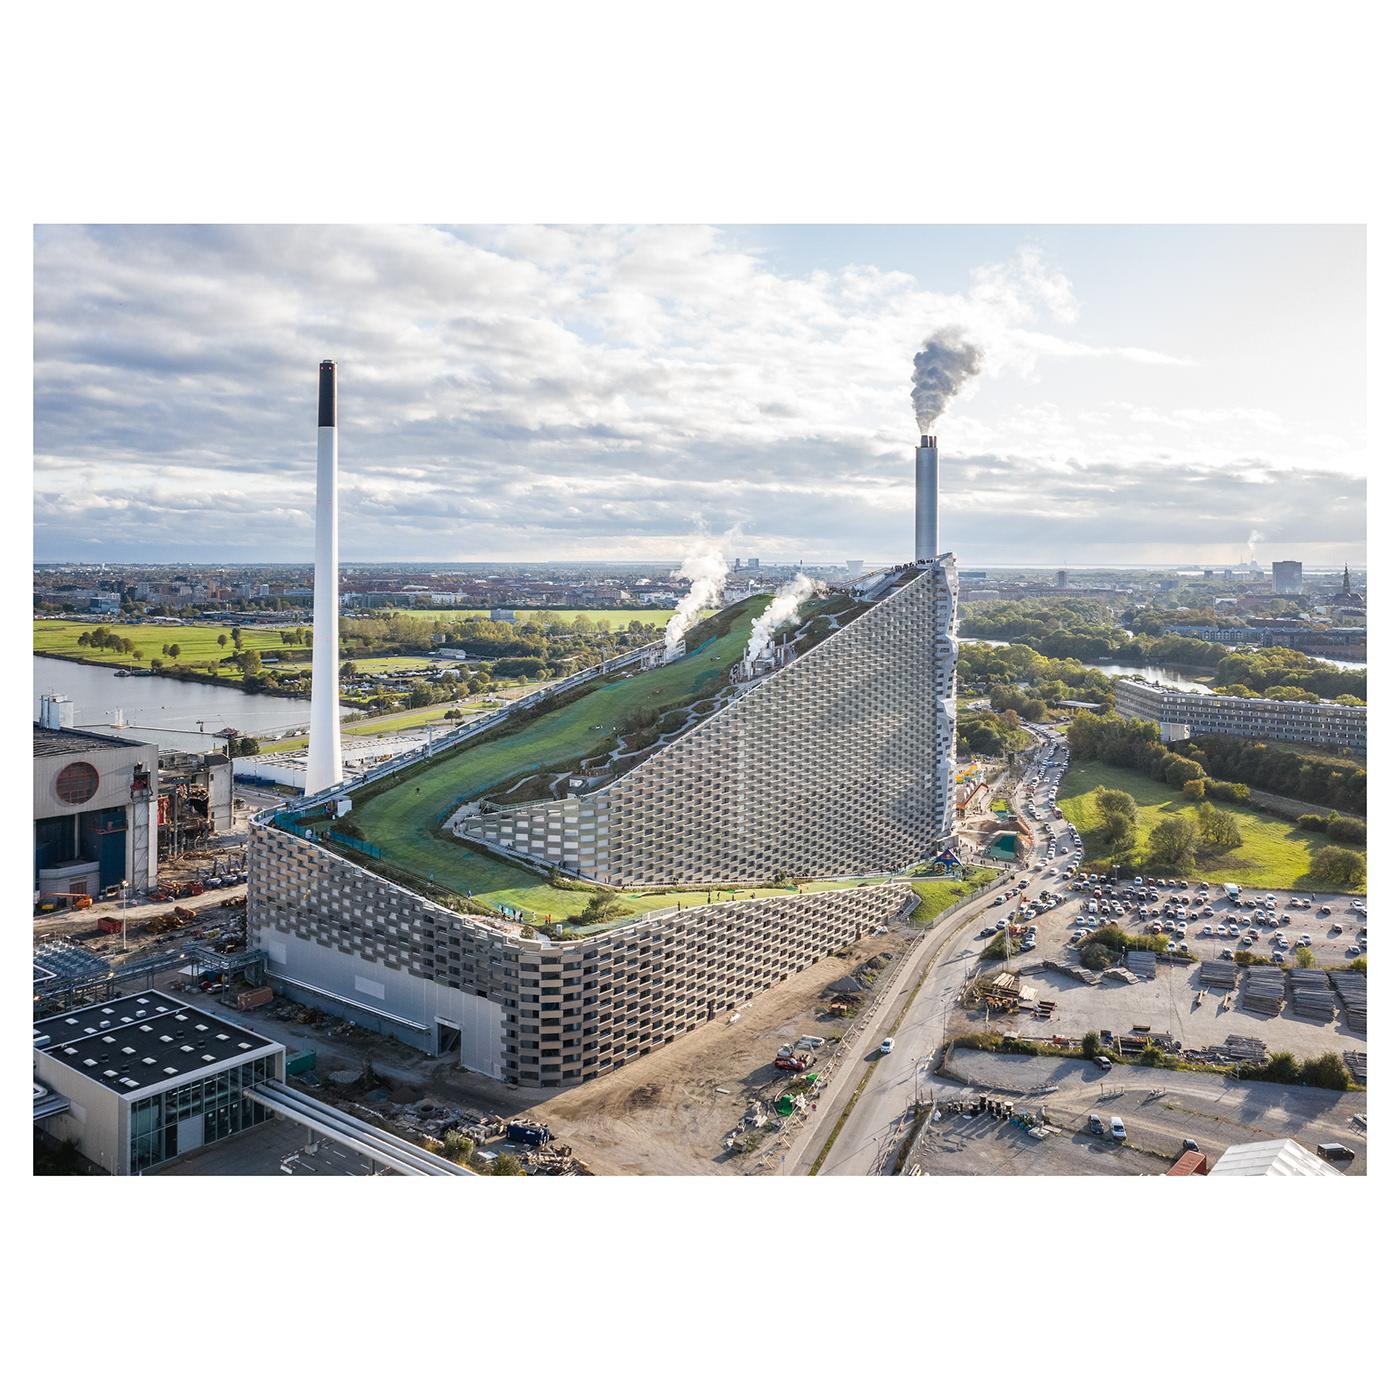 copenhill,Ski,architecture,renewable,big,Bjarke Ingels,Sustainable,copenhagen